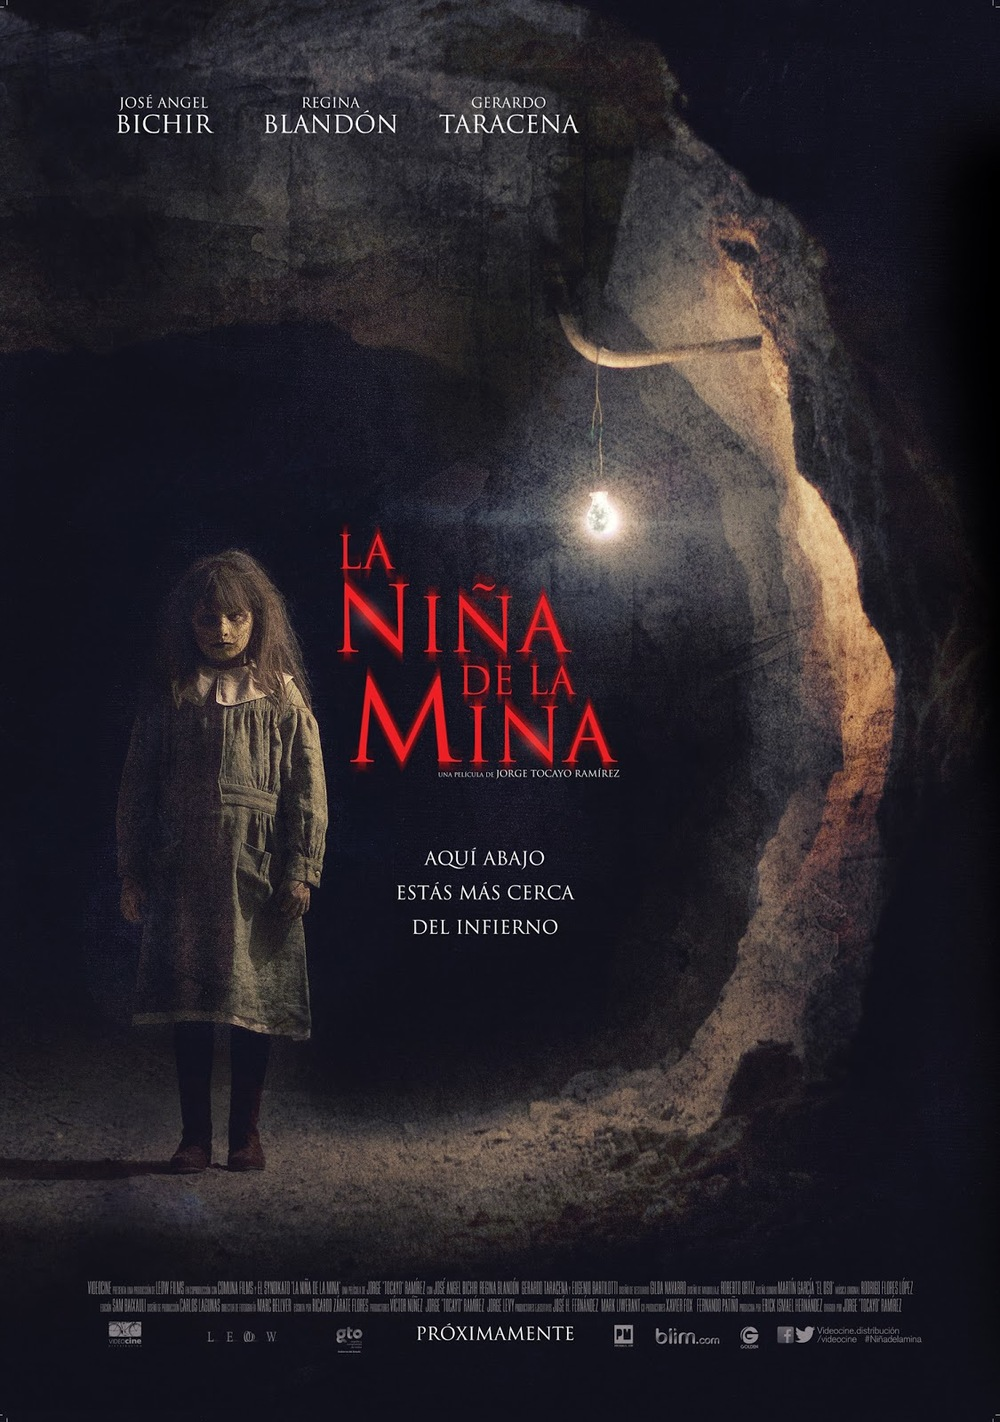 La Niña de la Mina (Largometraje) ESTRENO EN CINES EN MÉXICO: 1o de Julio de 2016